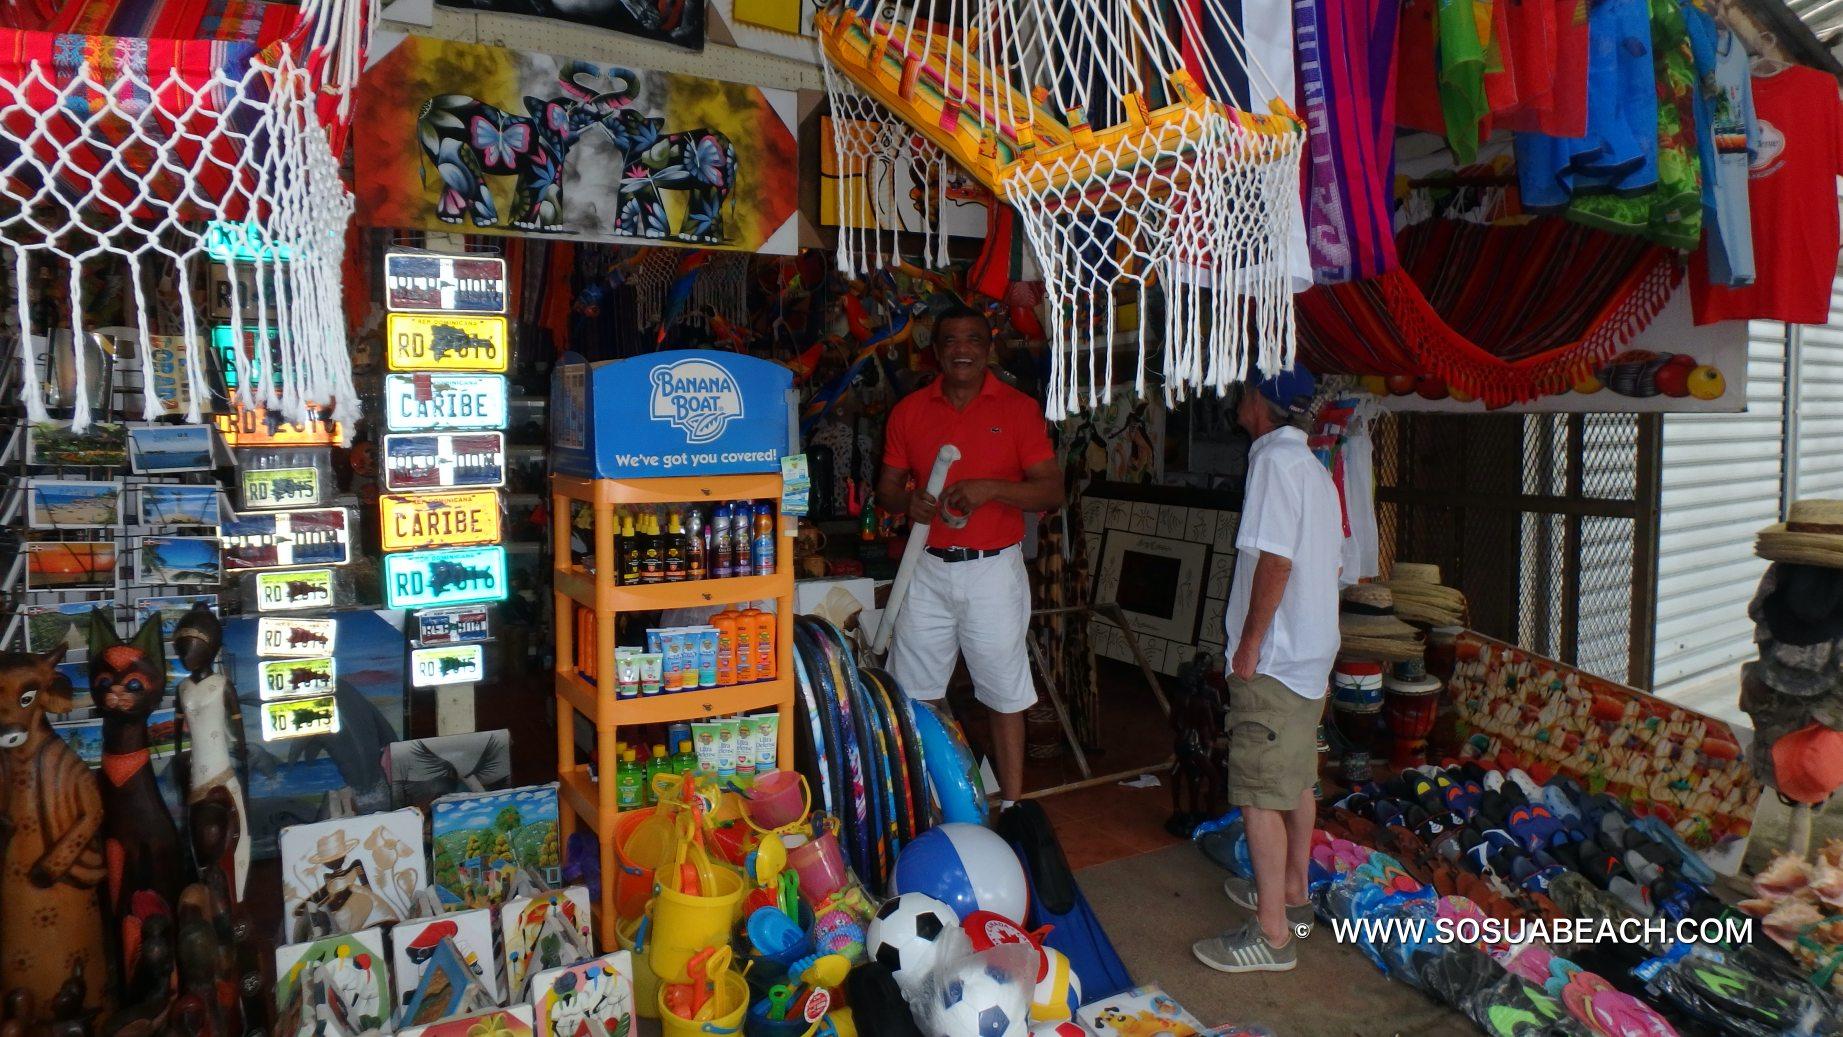 Sosua beach gift shop